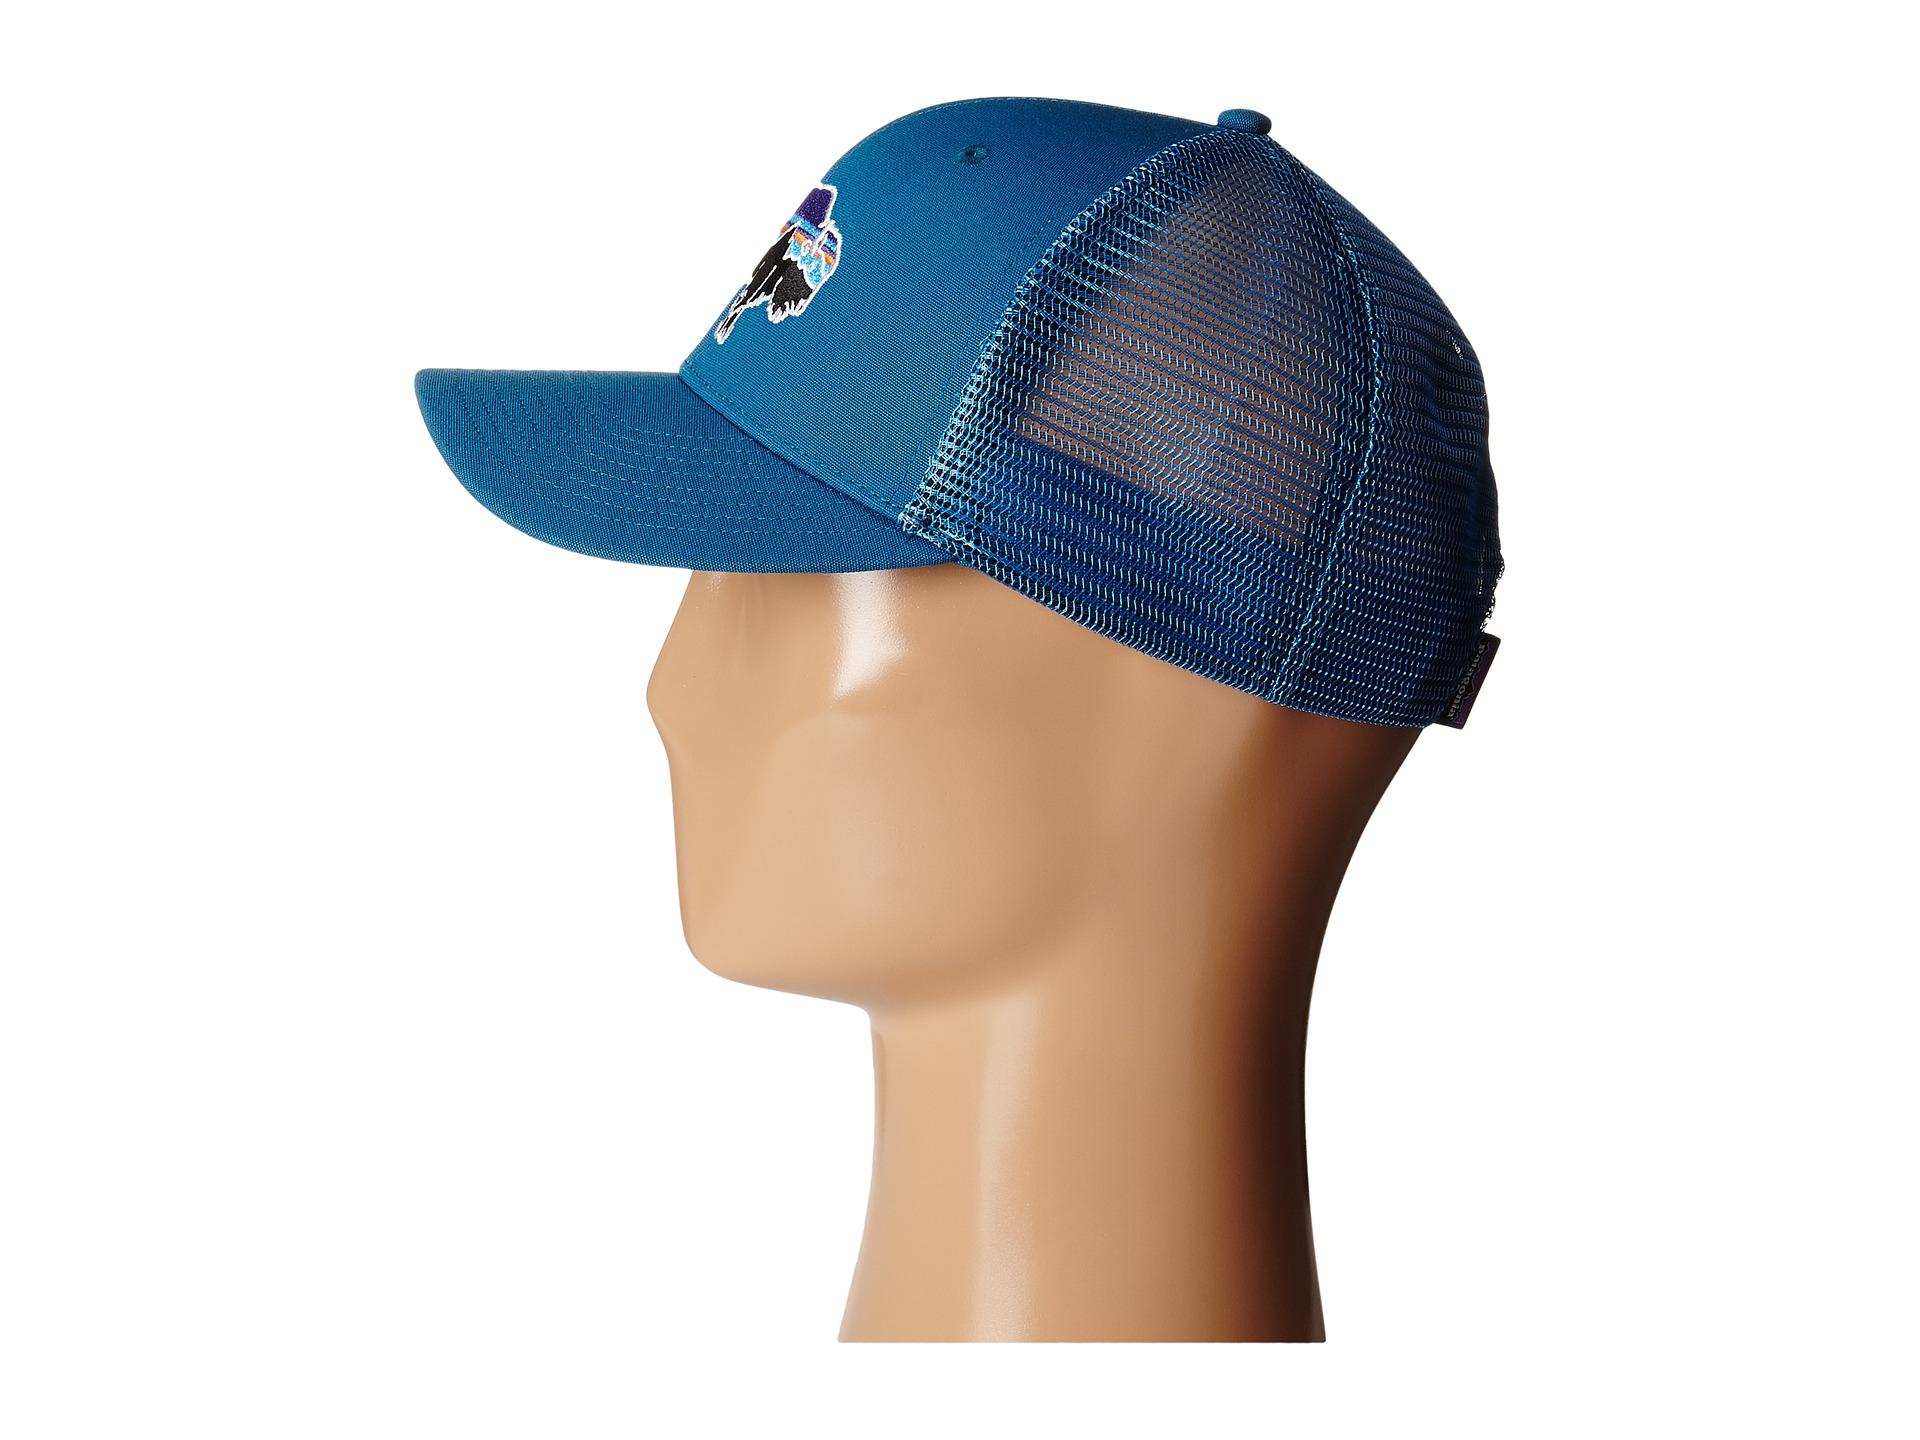 eb23863b Patagonia Fitz Roy Bison Trucker Hat in Blue - Lyst